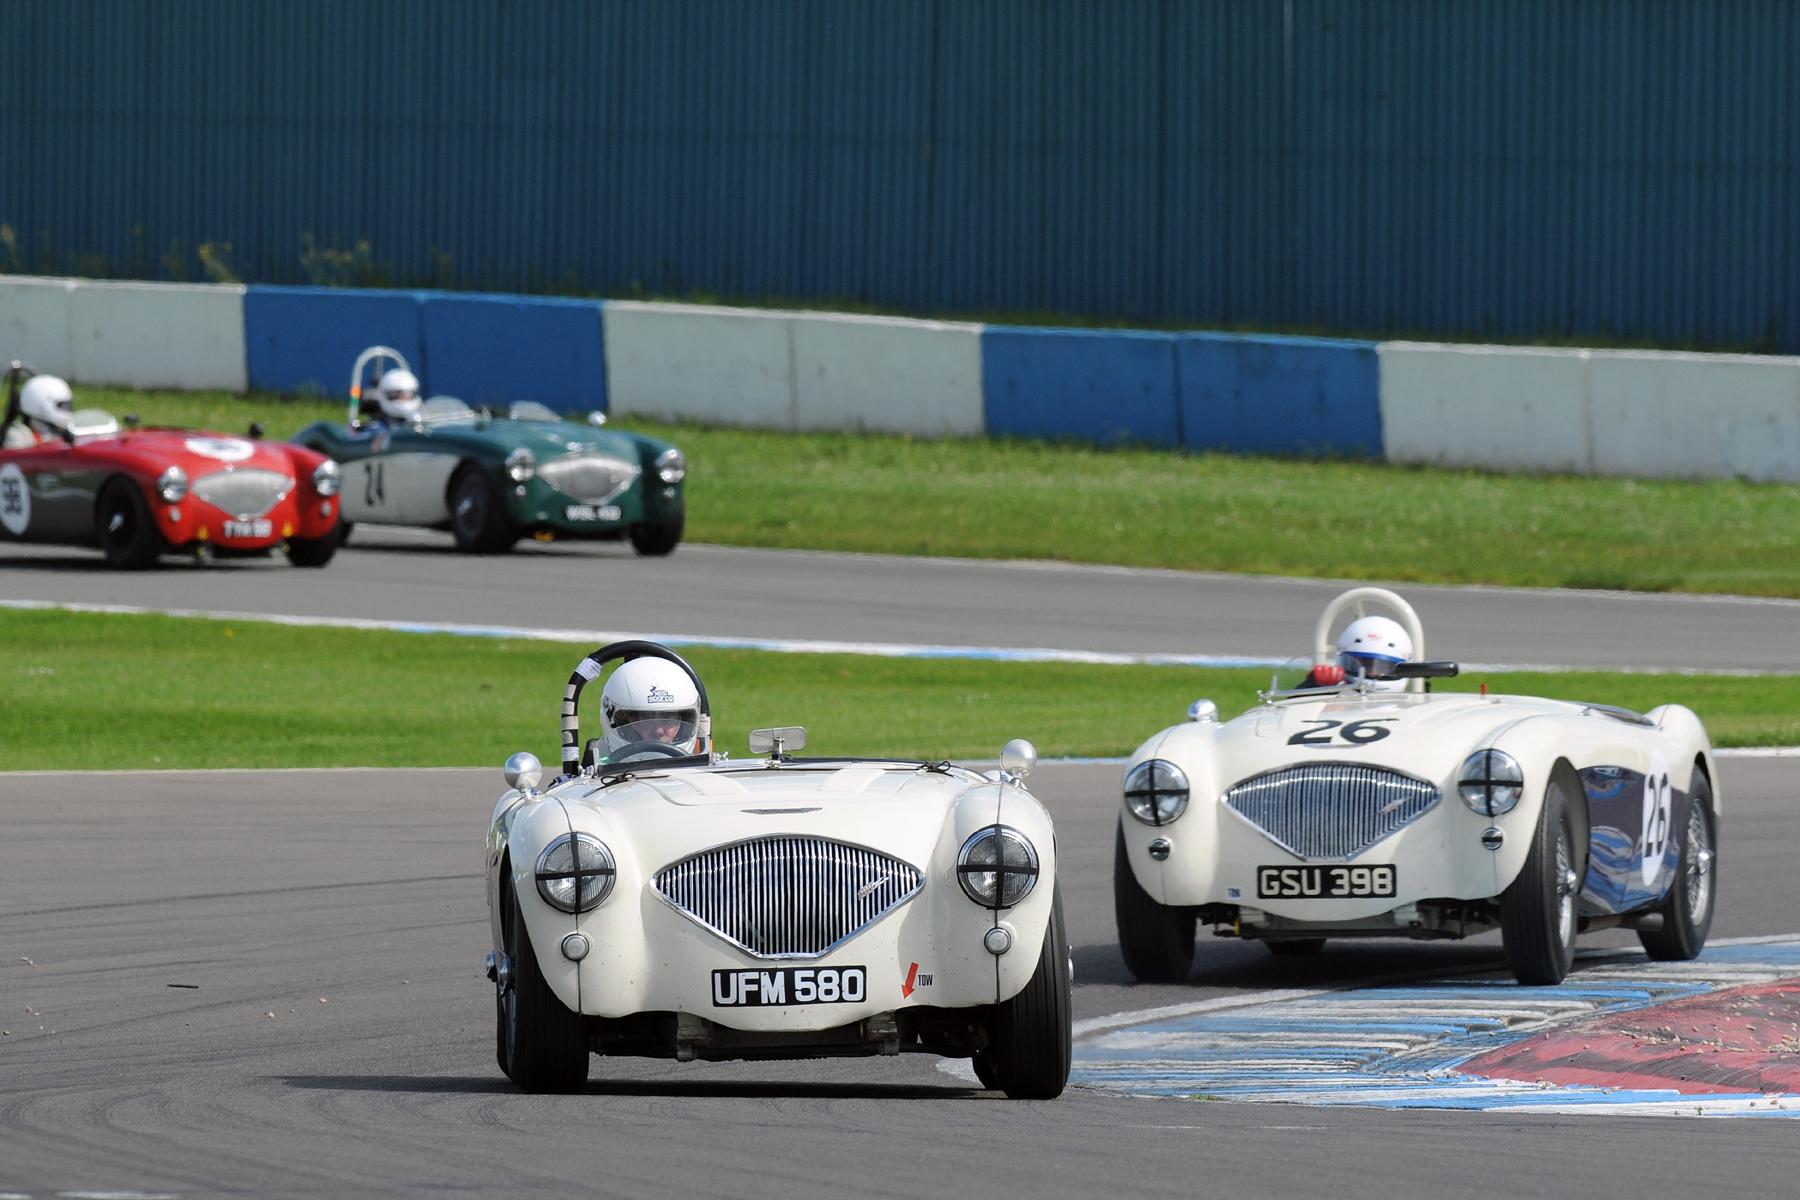 Matching pair - Andrew Dixey and Nigel Grice                              Photo - Steve Jones